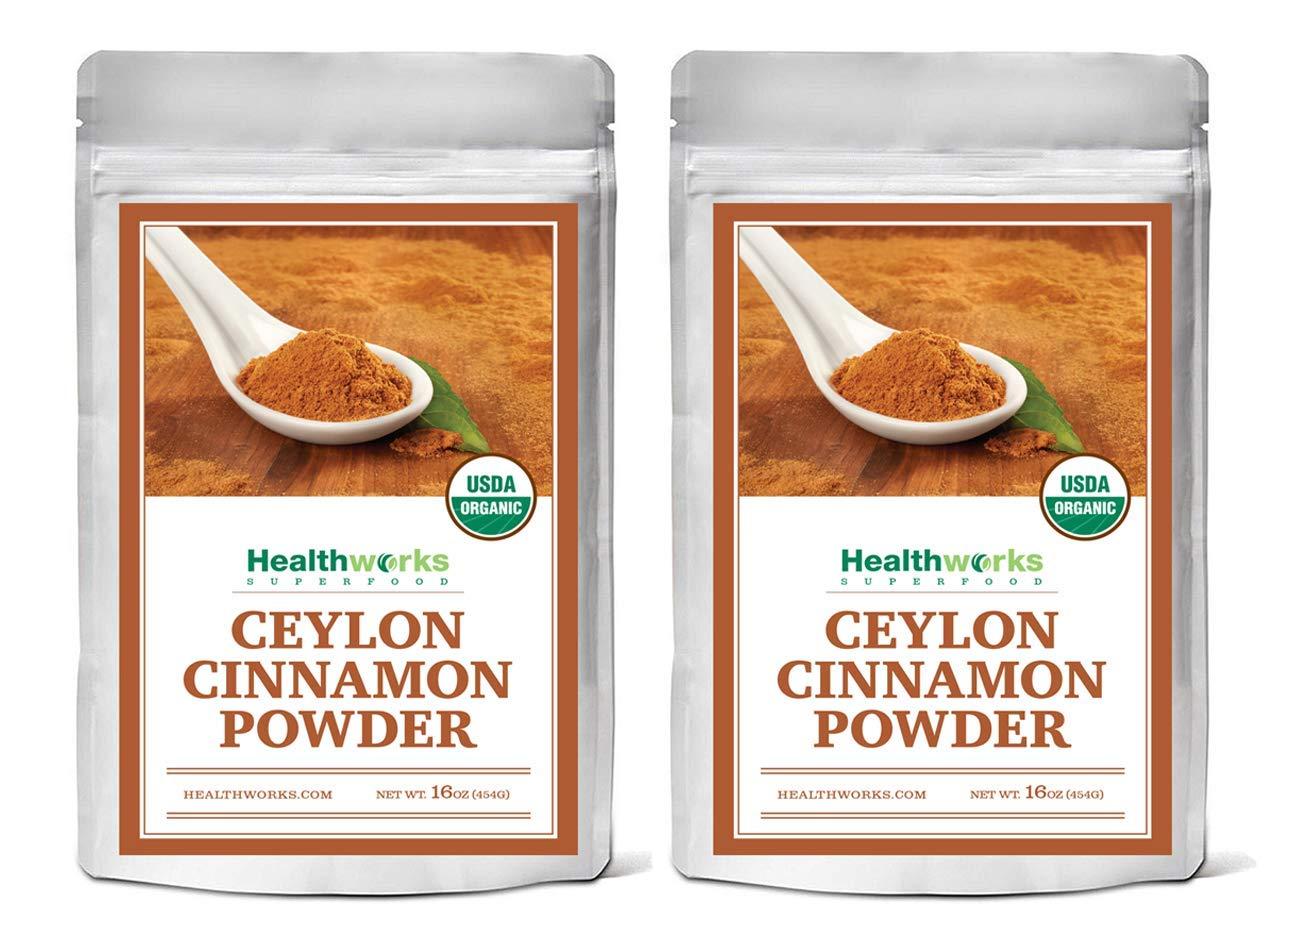 Healthworks Ceylon Cinnamon Powder Raw Organic, 2lb, (packaging may vary)